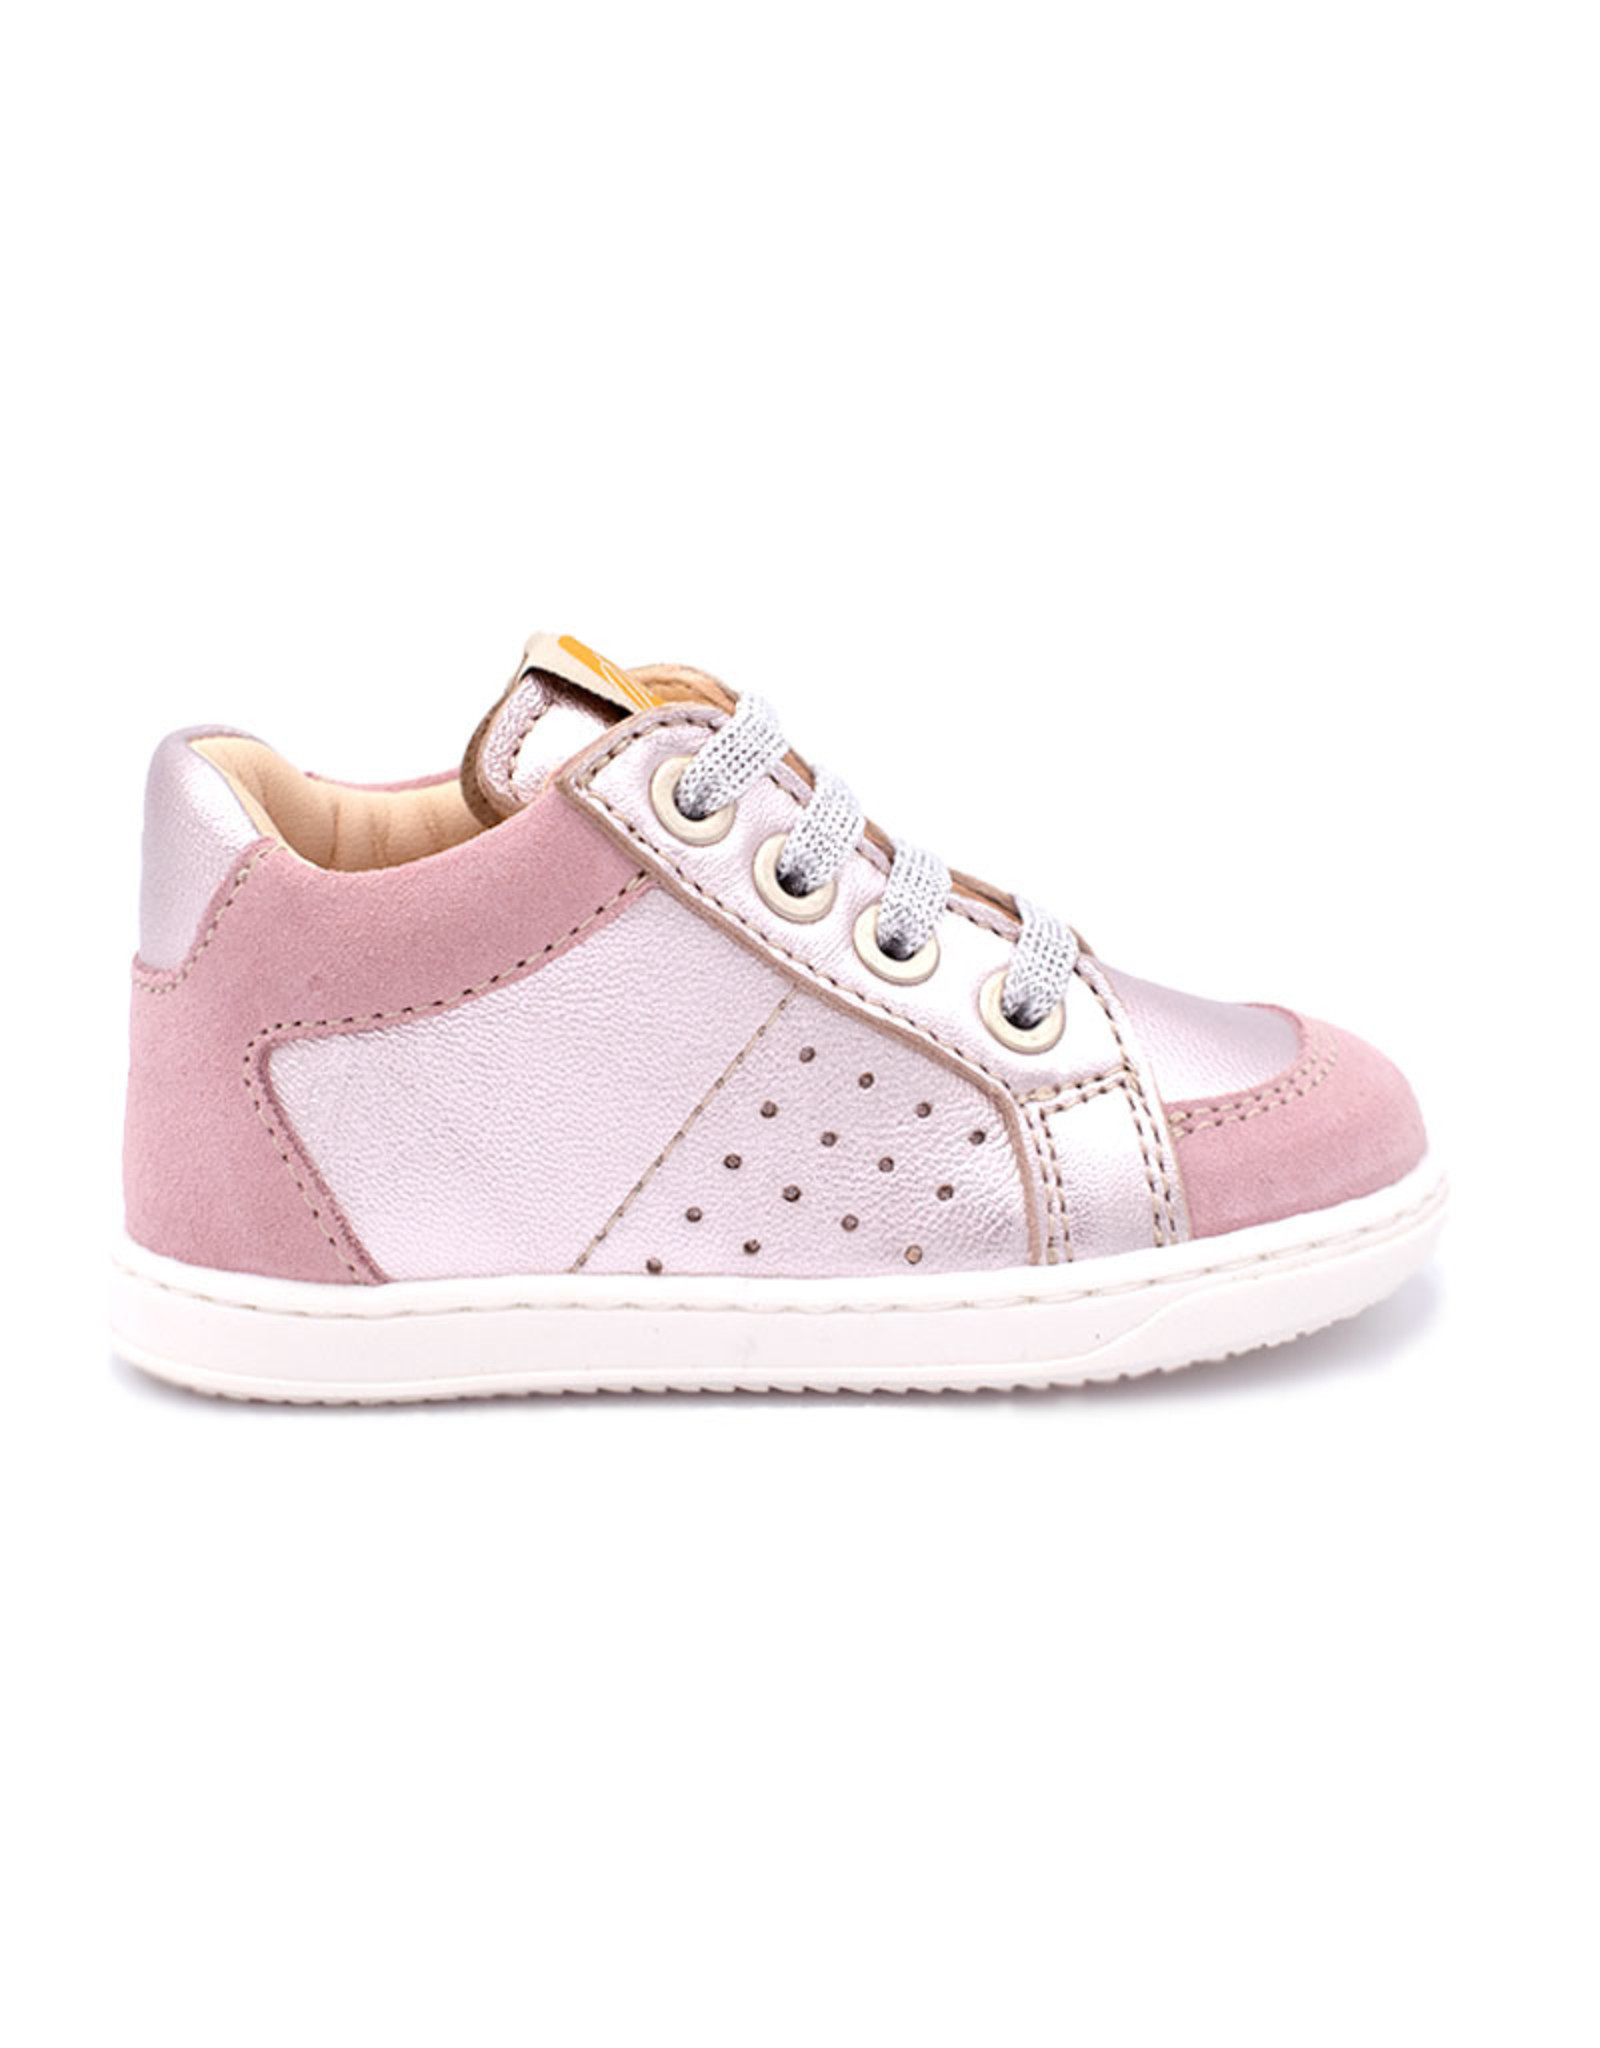 OCRA OCRA eerste stapper sneaker roze